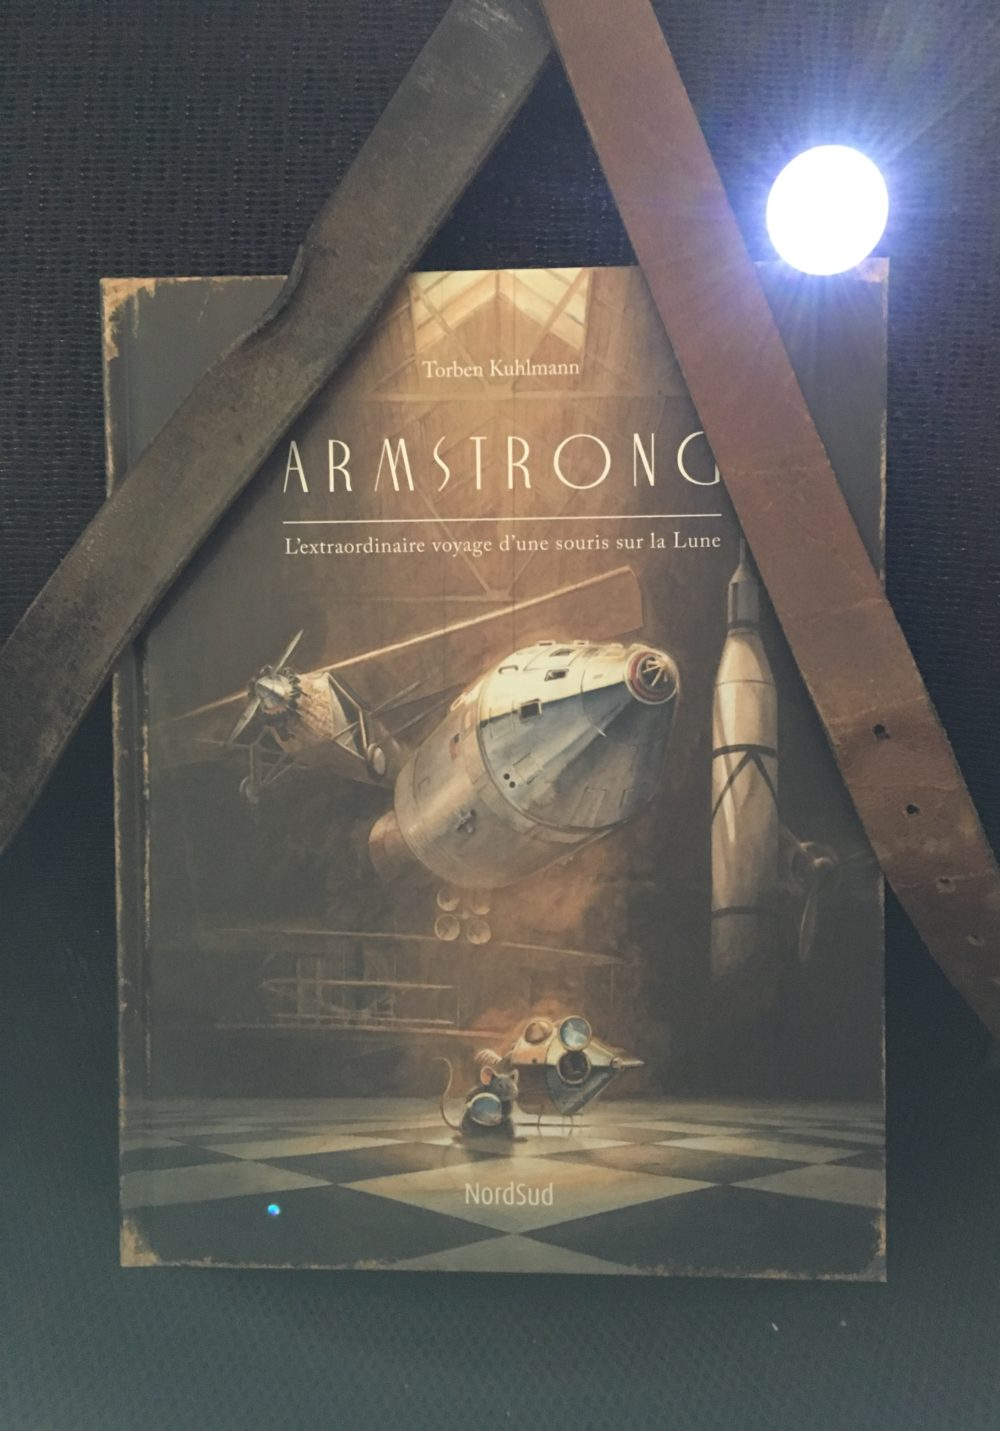 ARMSTRONG, Torben Kuhlmann, éditions NordSud